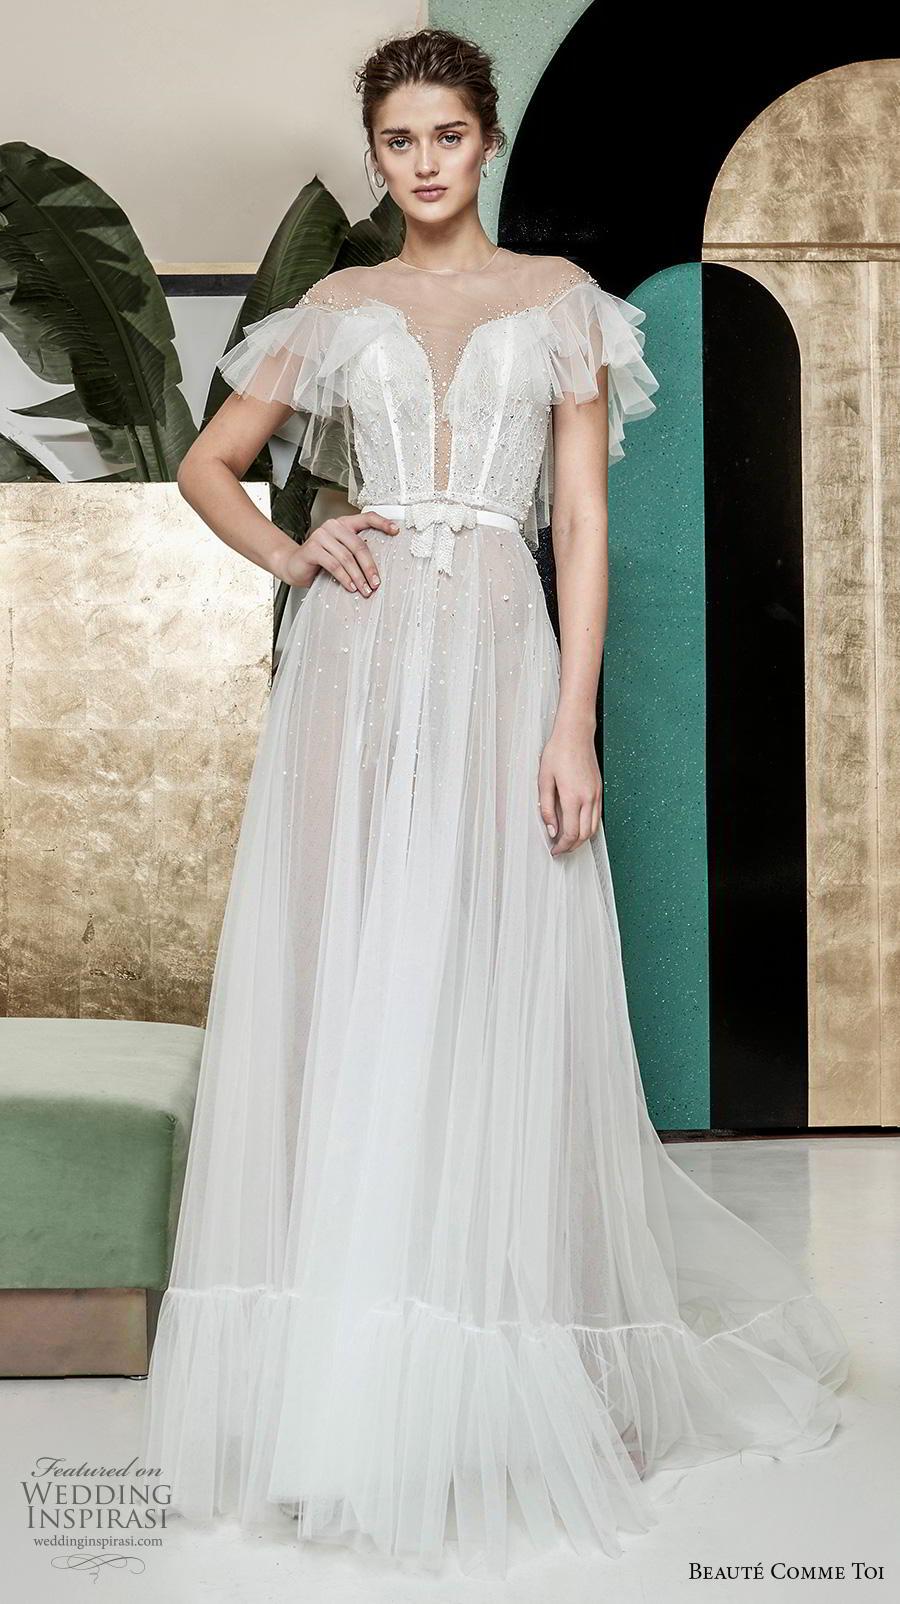 Retro Wedding Dresses.Breathtaking Modern Vintage Wedding Dresses By Beaute